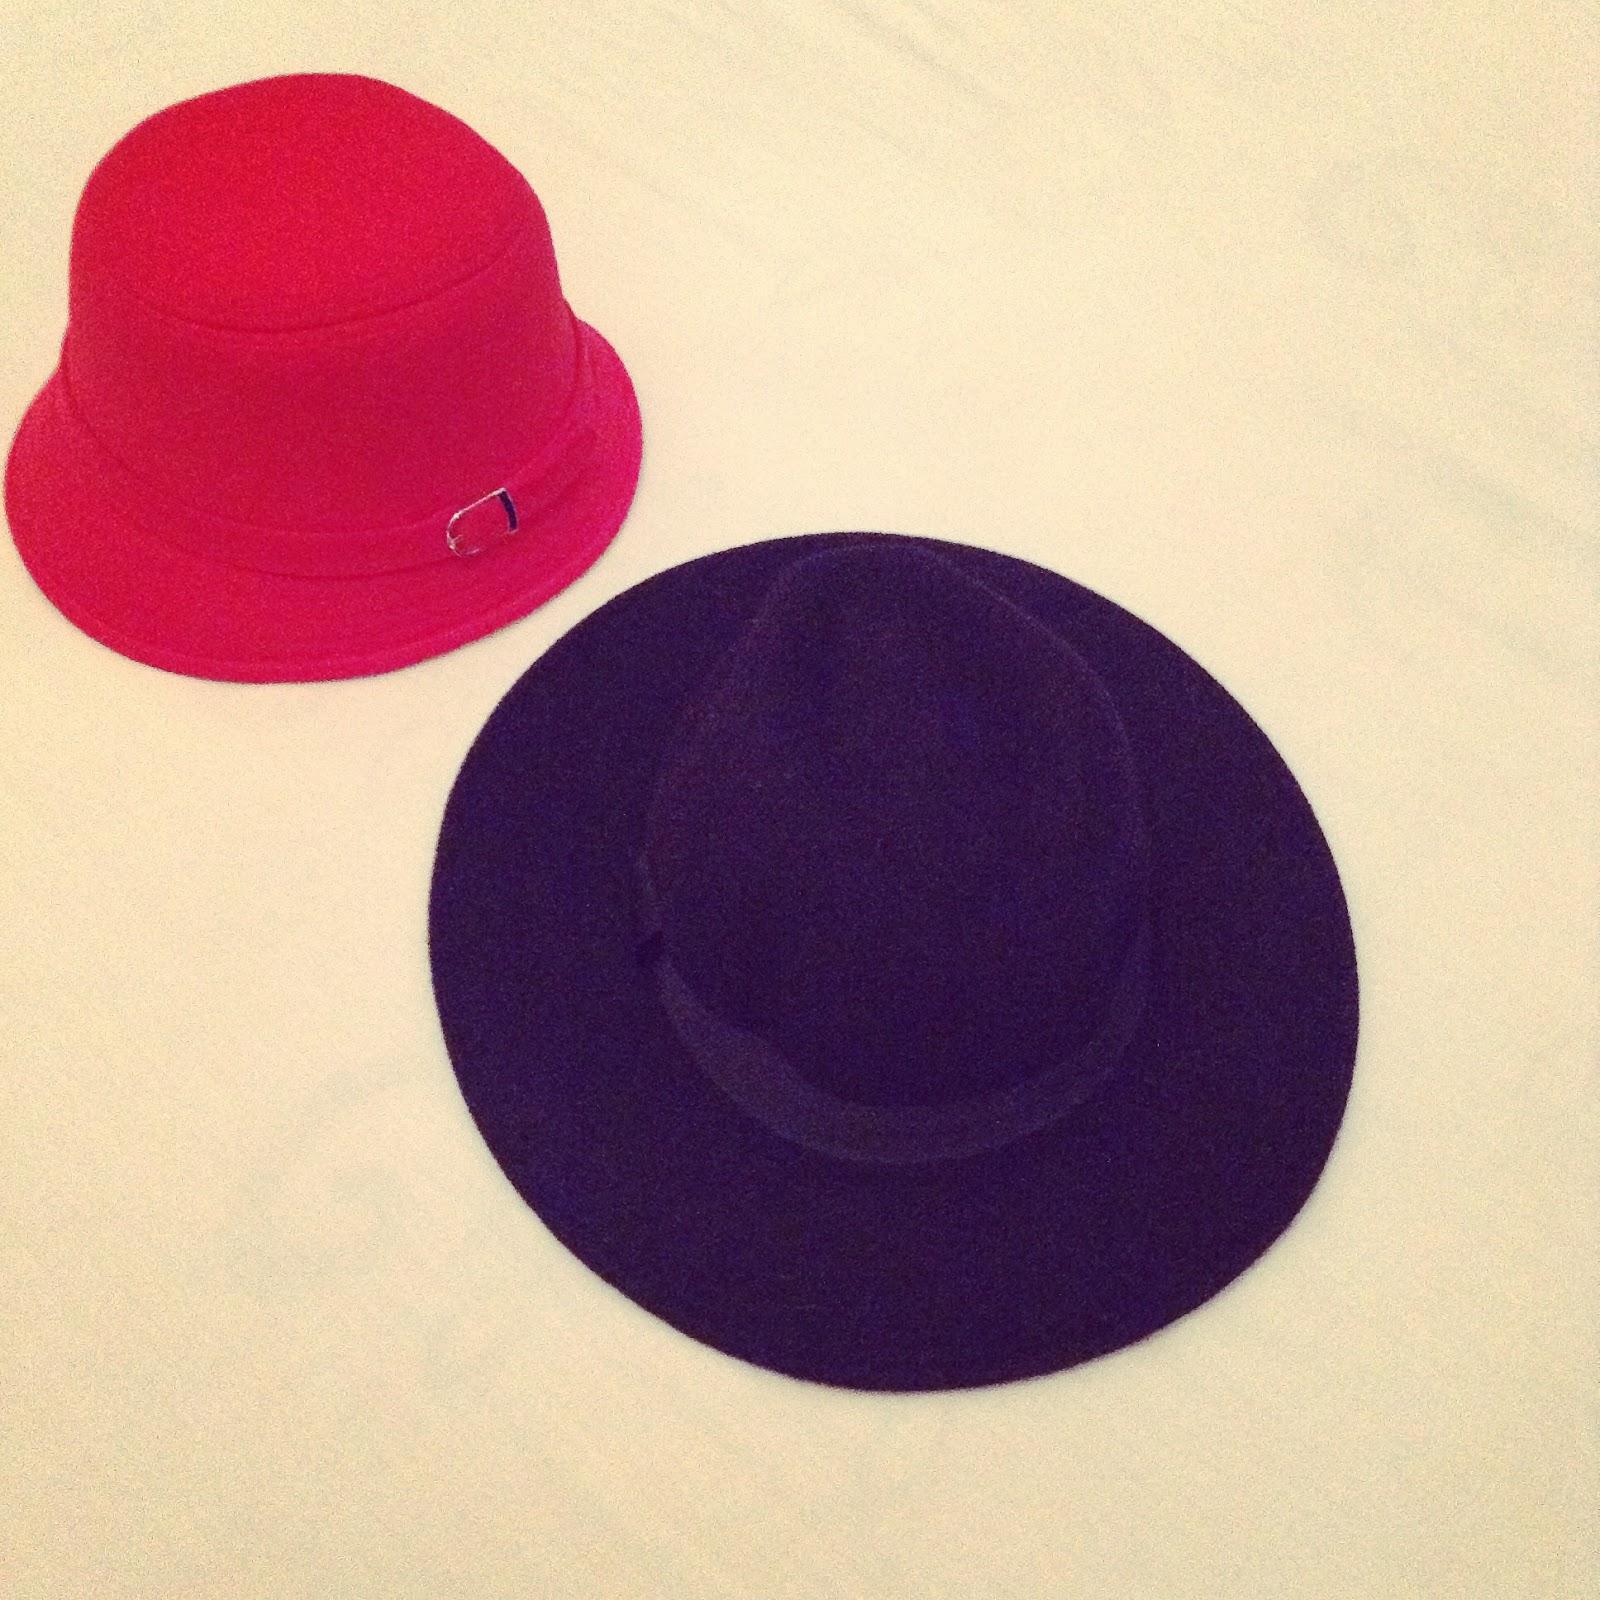 Sombrero rojo -Las Penélope-  Sombrero negro -H M-. e1c7de96cc5